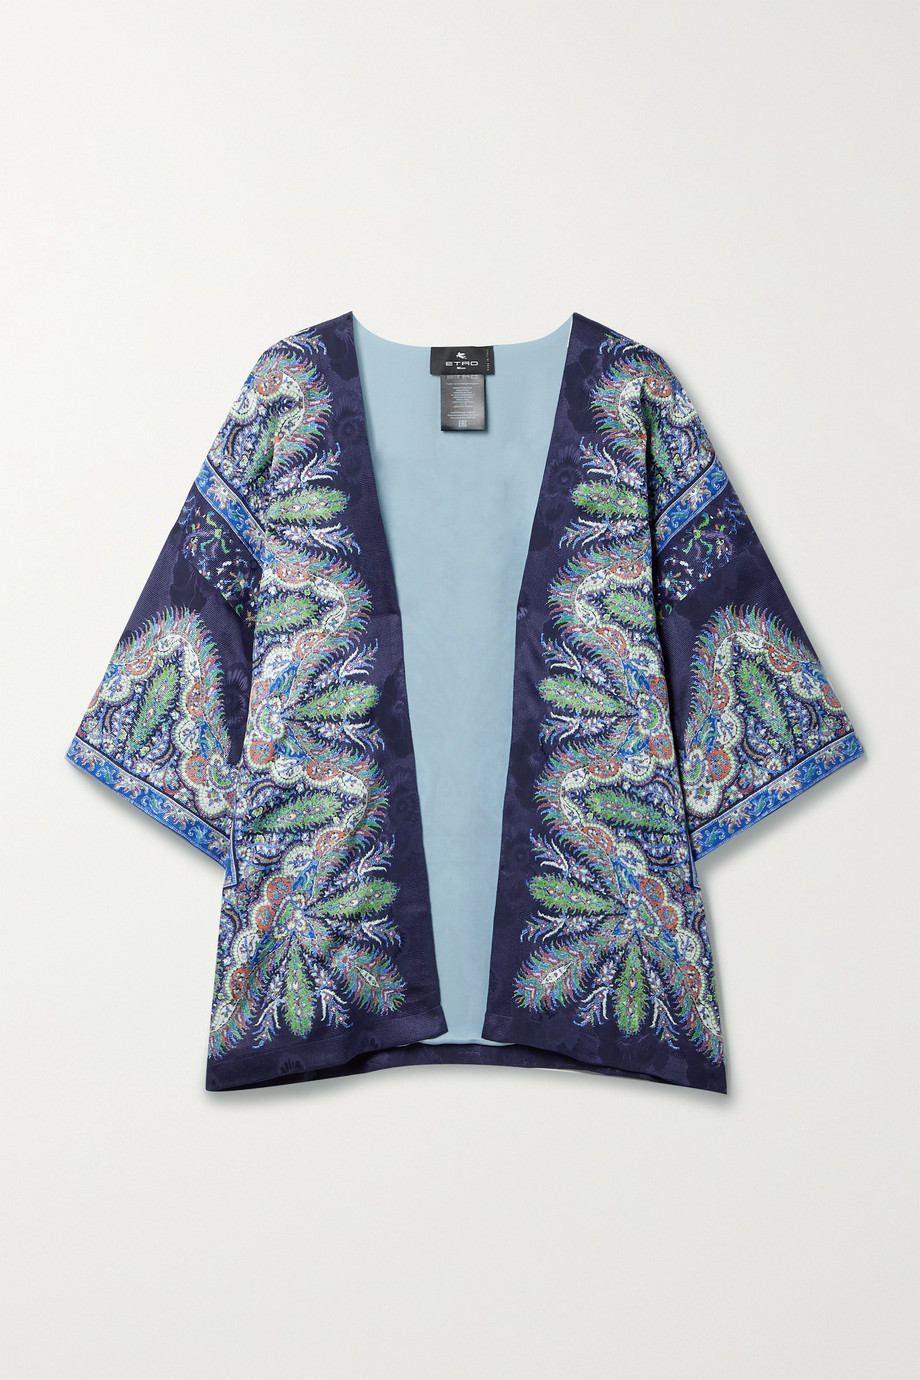 Etro Kesa paisley-print silk-satin jacquard wrap